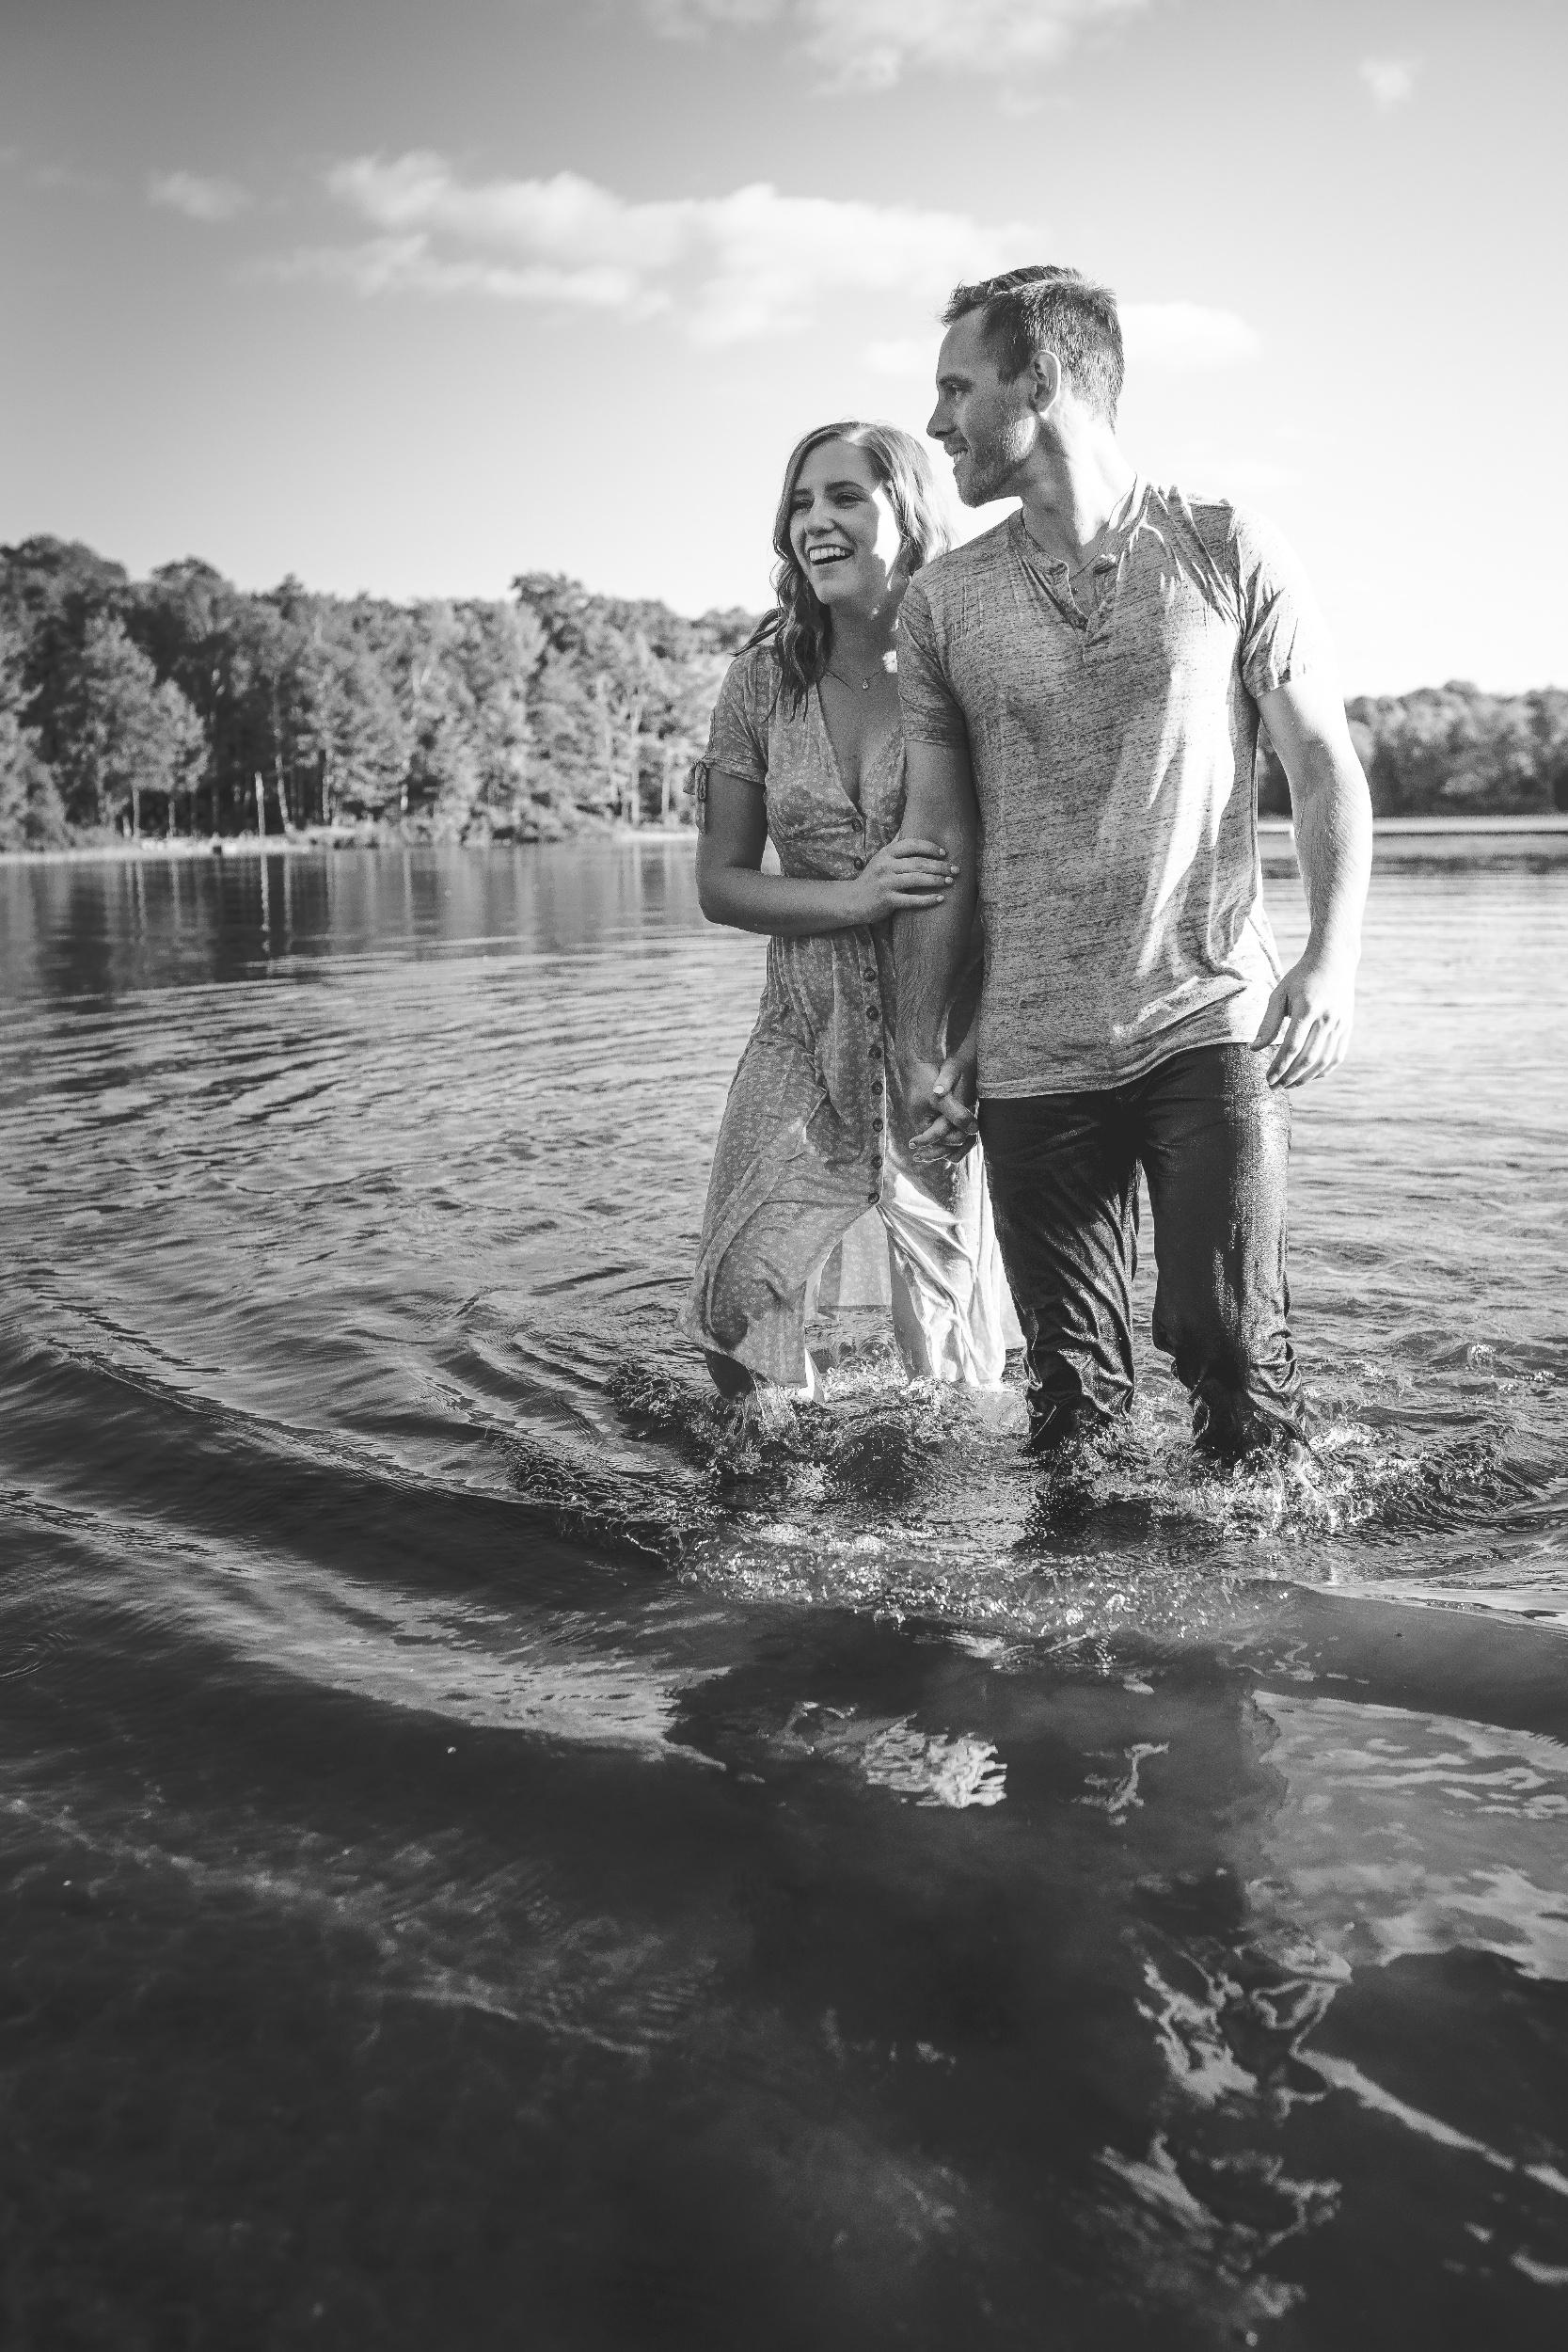 processed_Amy D Photography- Barrie Wedding Photographer-Cottage Engagement- Engagement Pose- Muskoka Wedding Photographer-113.jpg